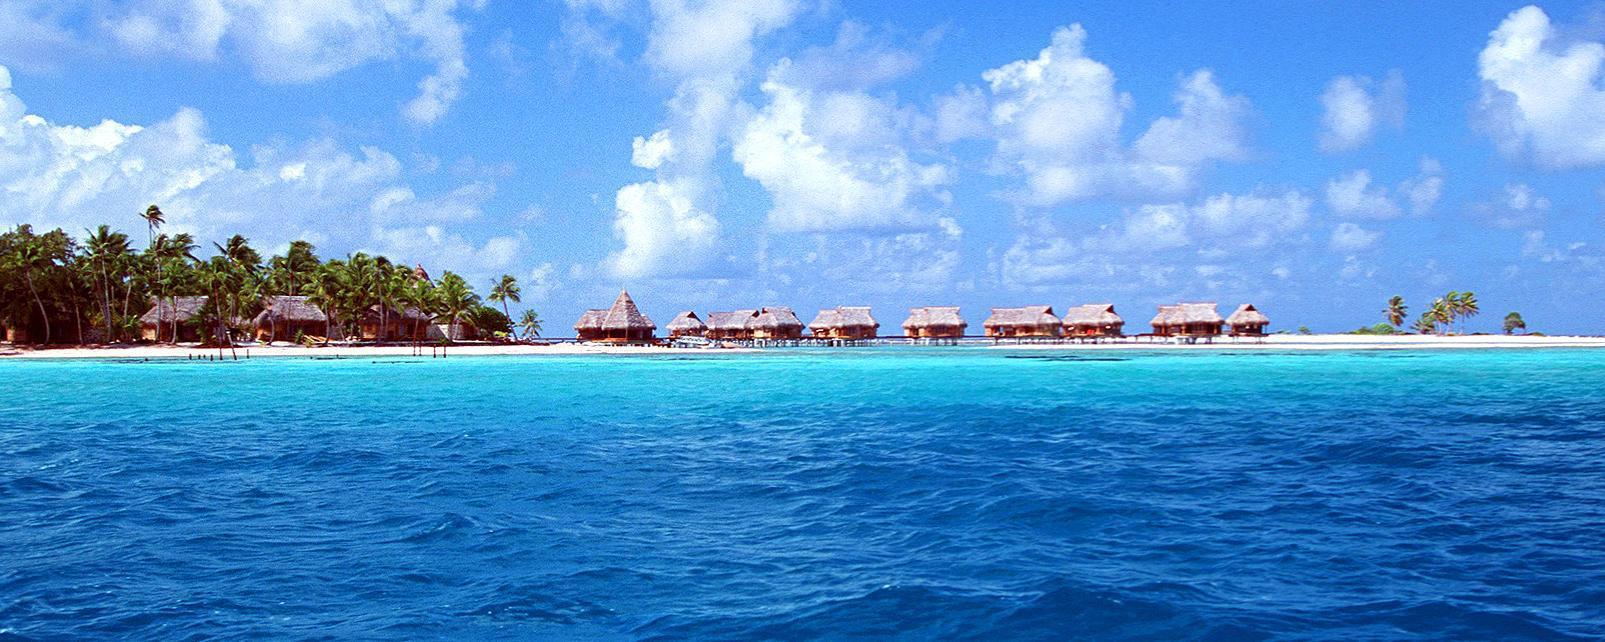 Océan Pacifique; Polynésie; Tuamotu; Tikehau;